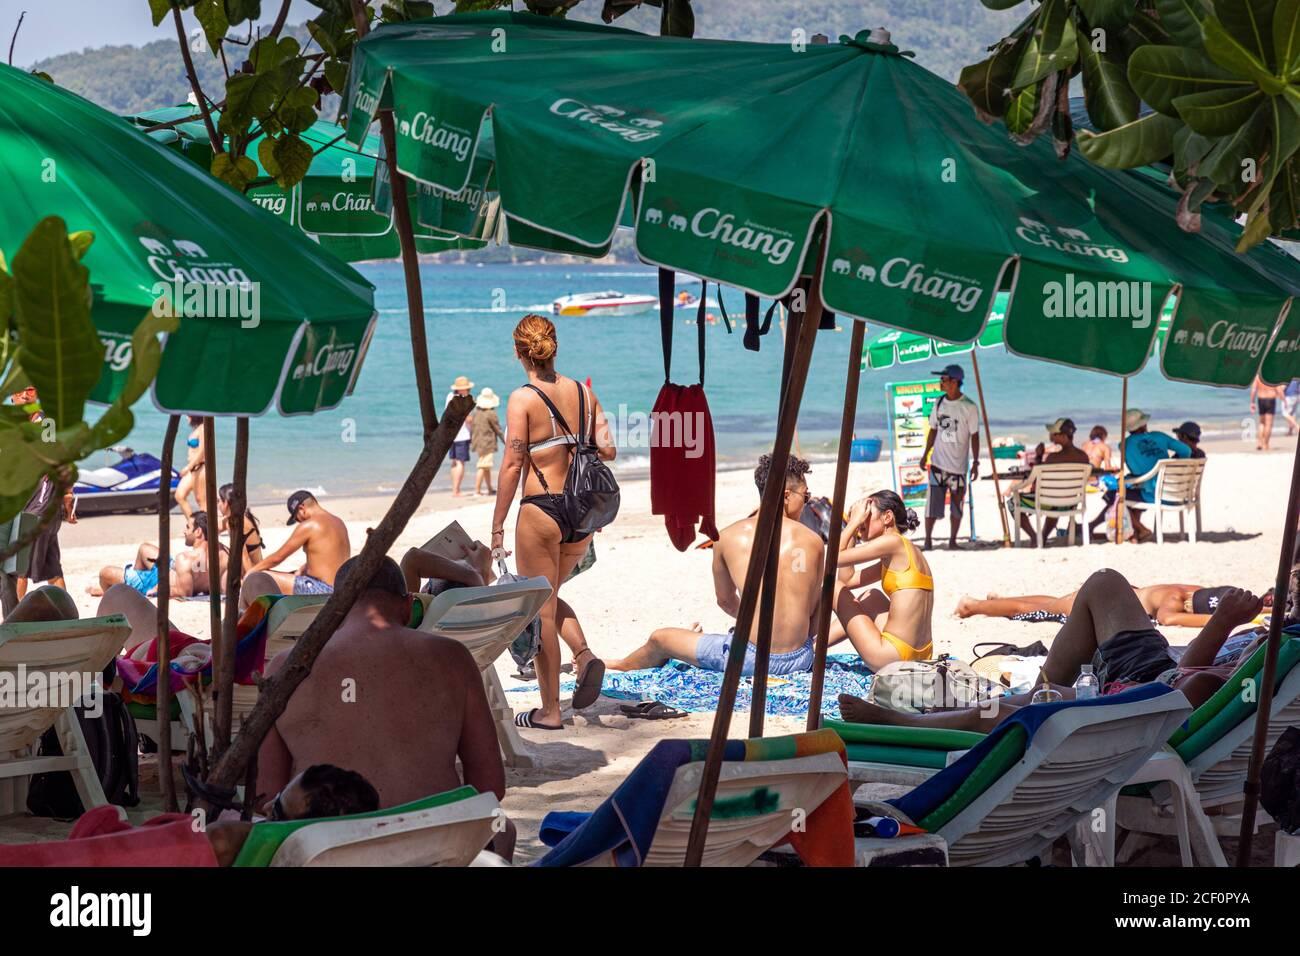 Tourist in the shade under beach umbrellas, Patong, Phuket, Thailand Stock Photo